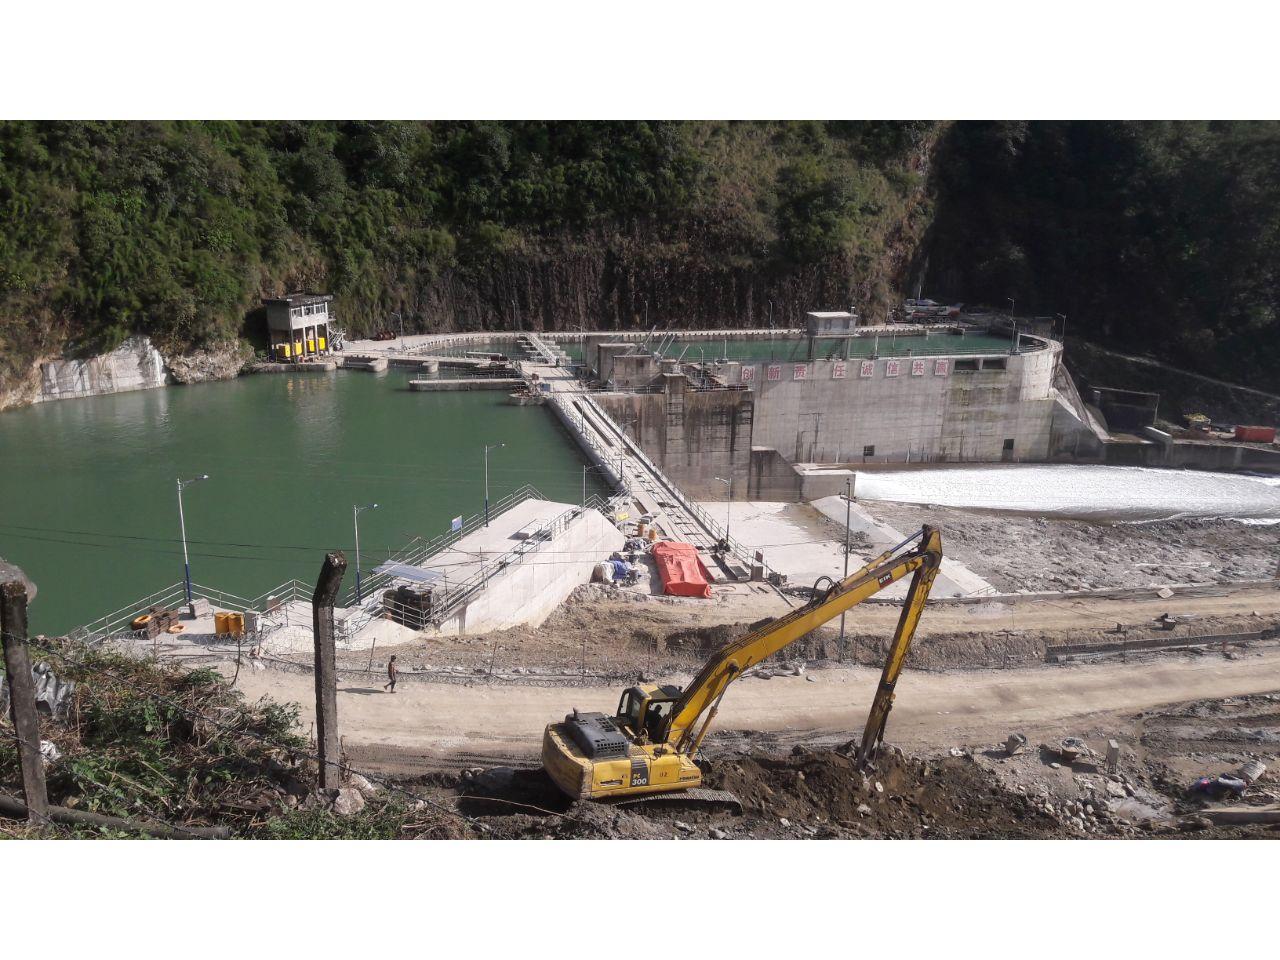 Upper Bhote Koshi Hydro Electric